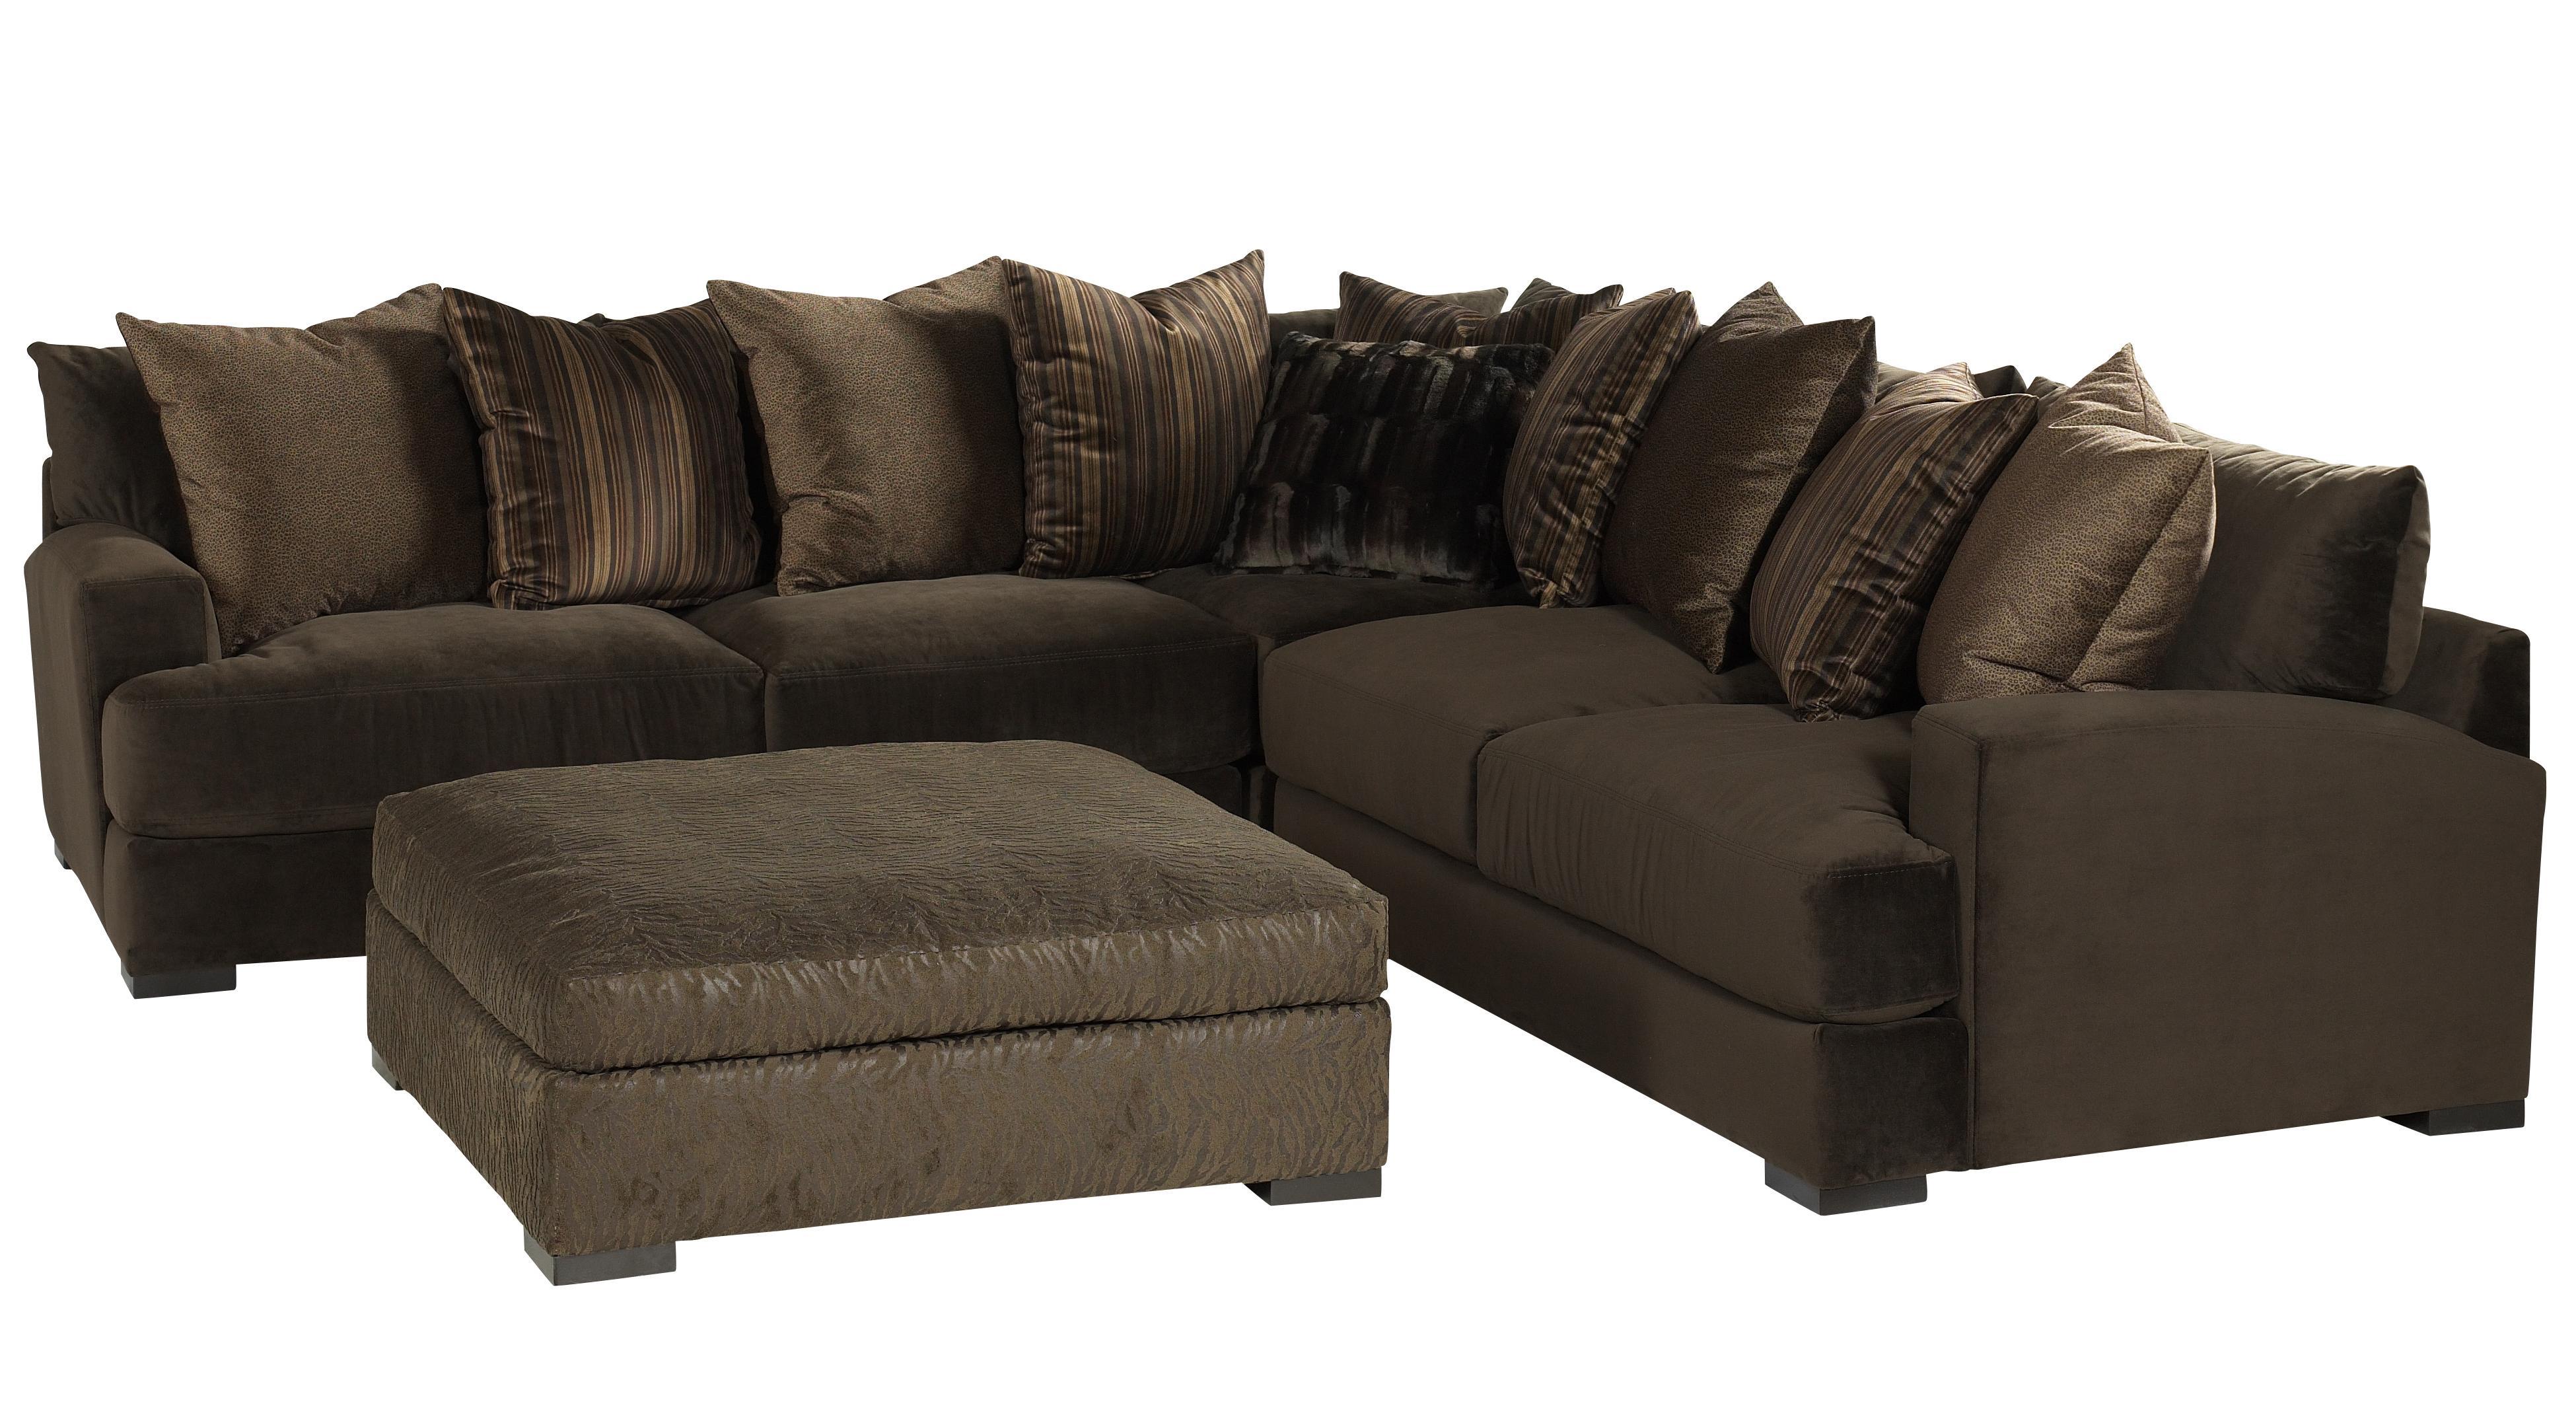 Stationary Sofa Sectional